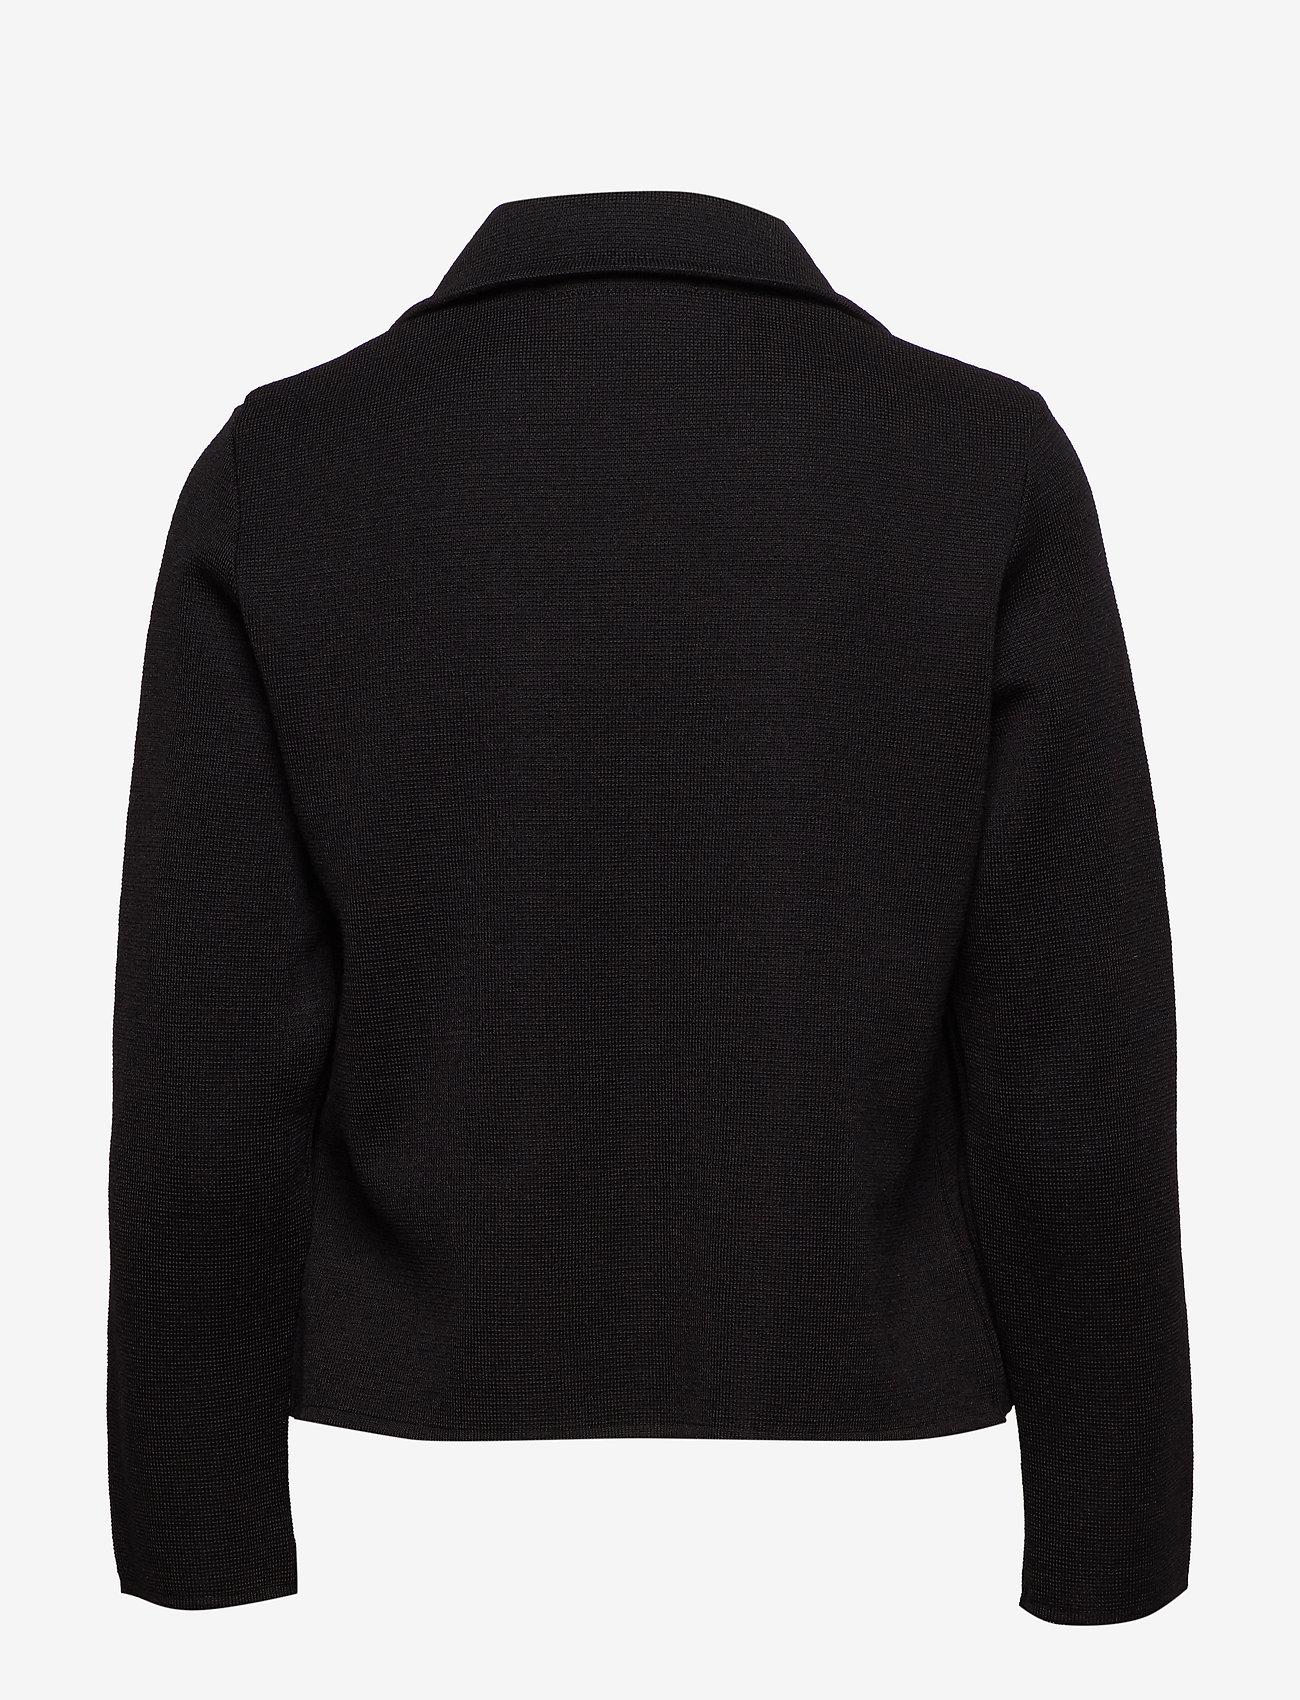 BUSNEL - Indra jacket - light jackets - black - 1